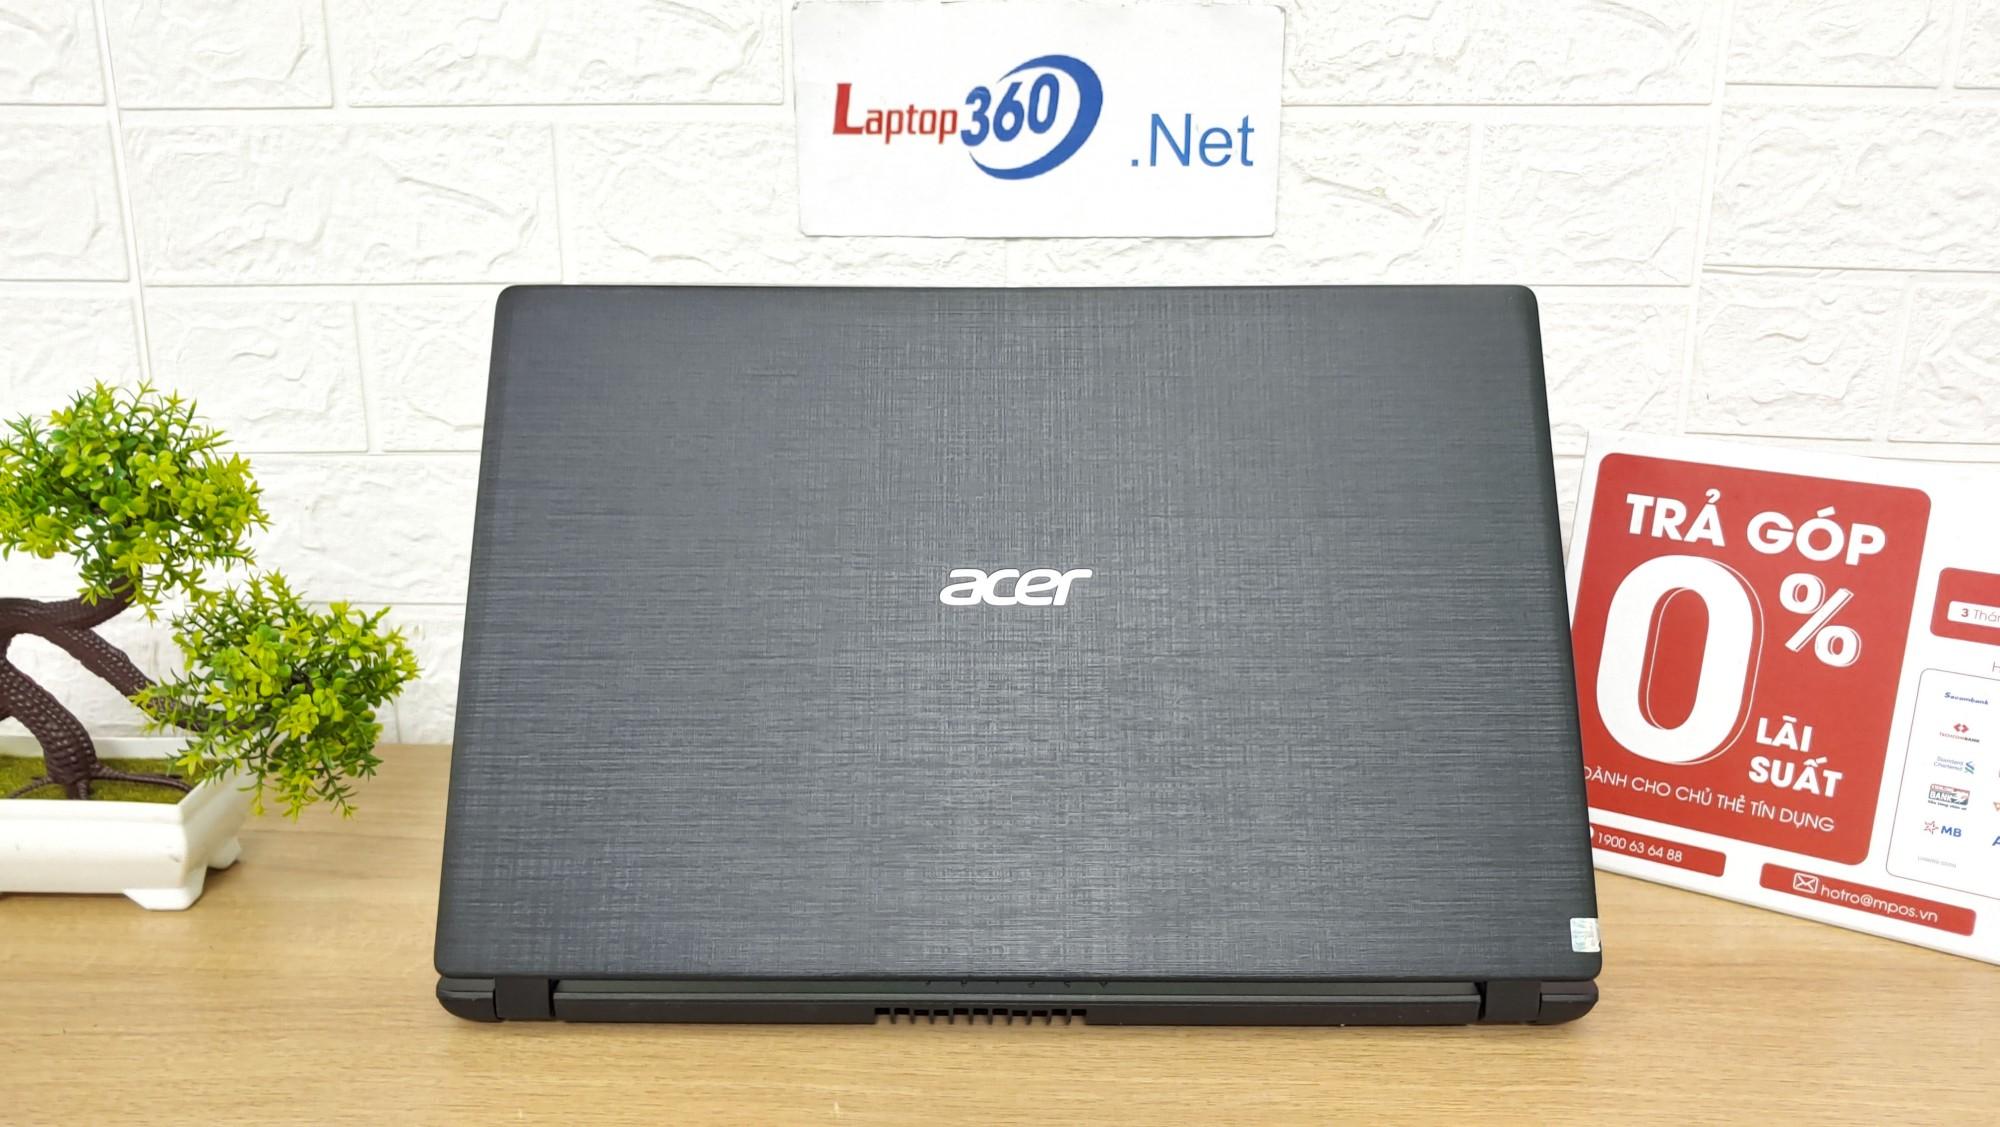 Laptop Acer A315-31